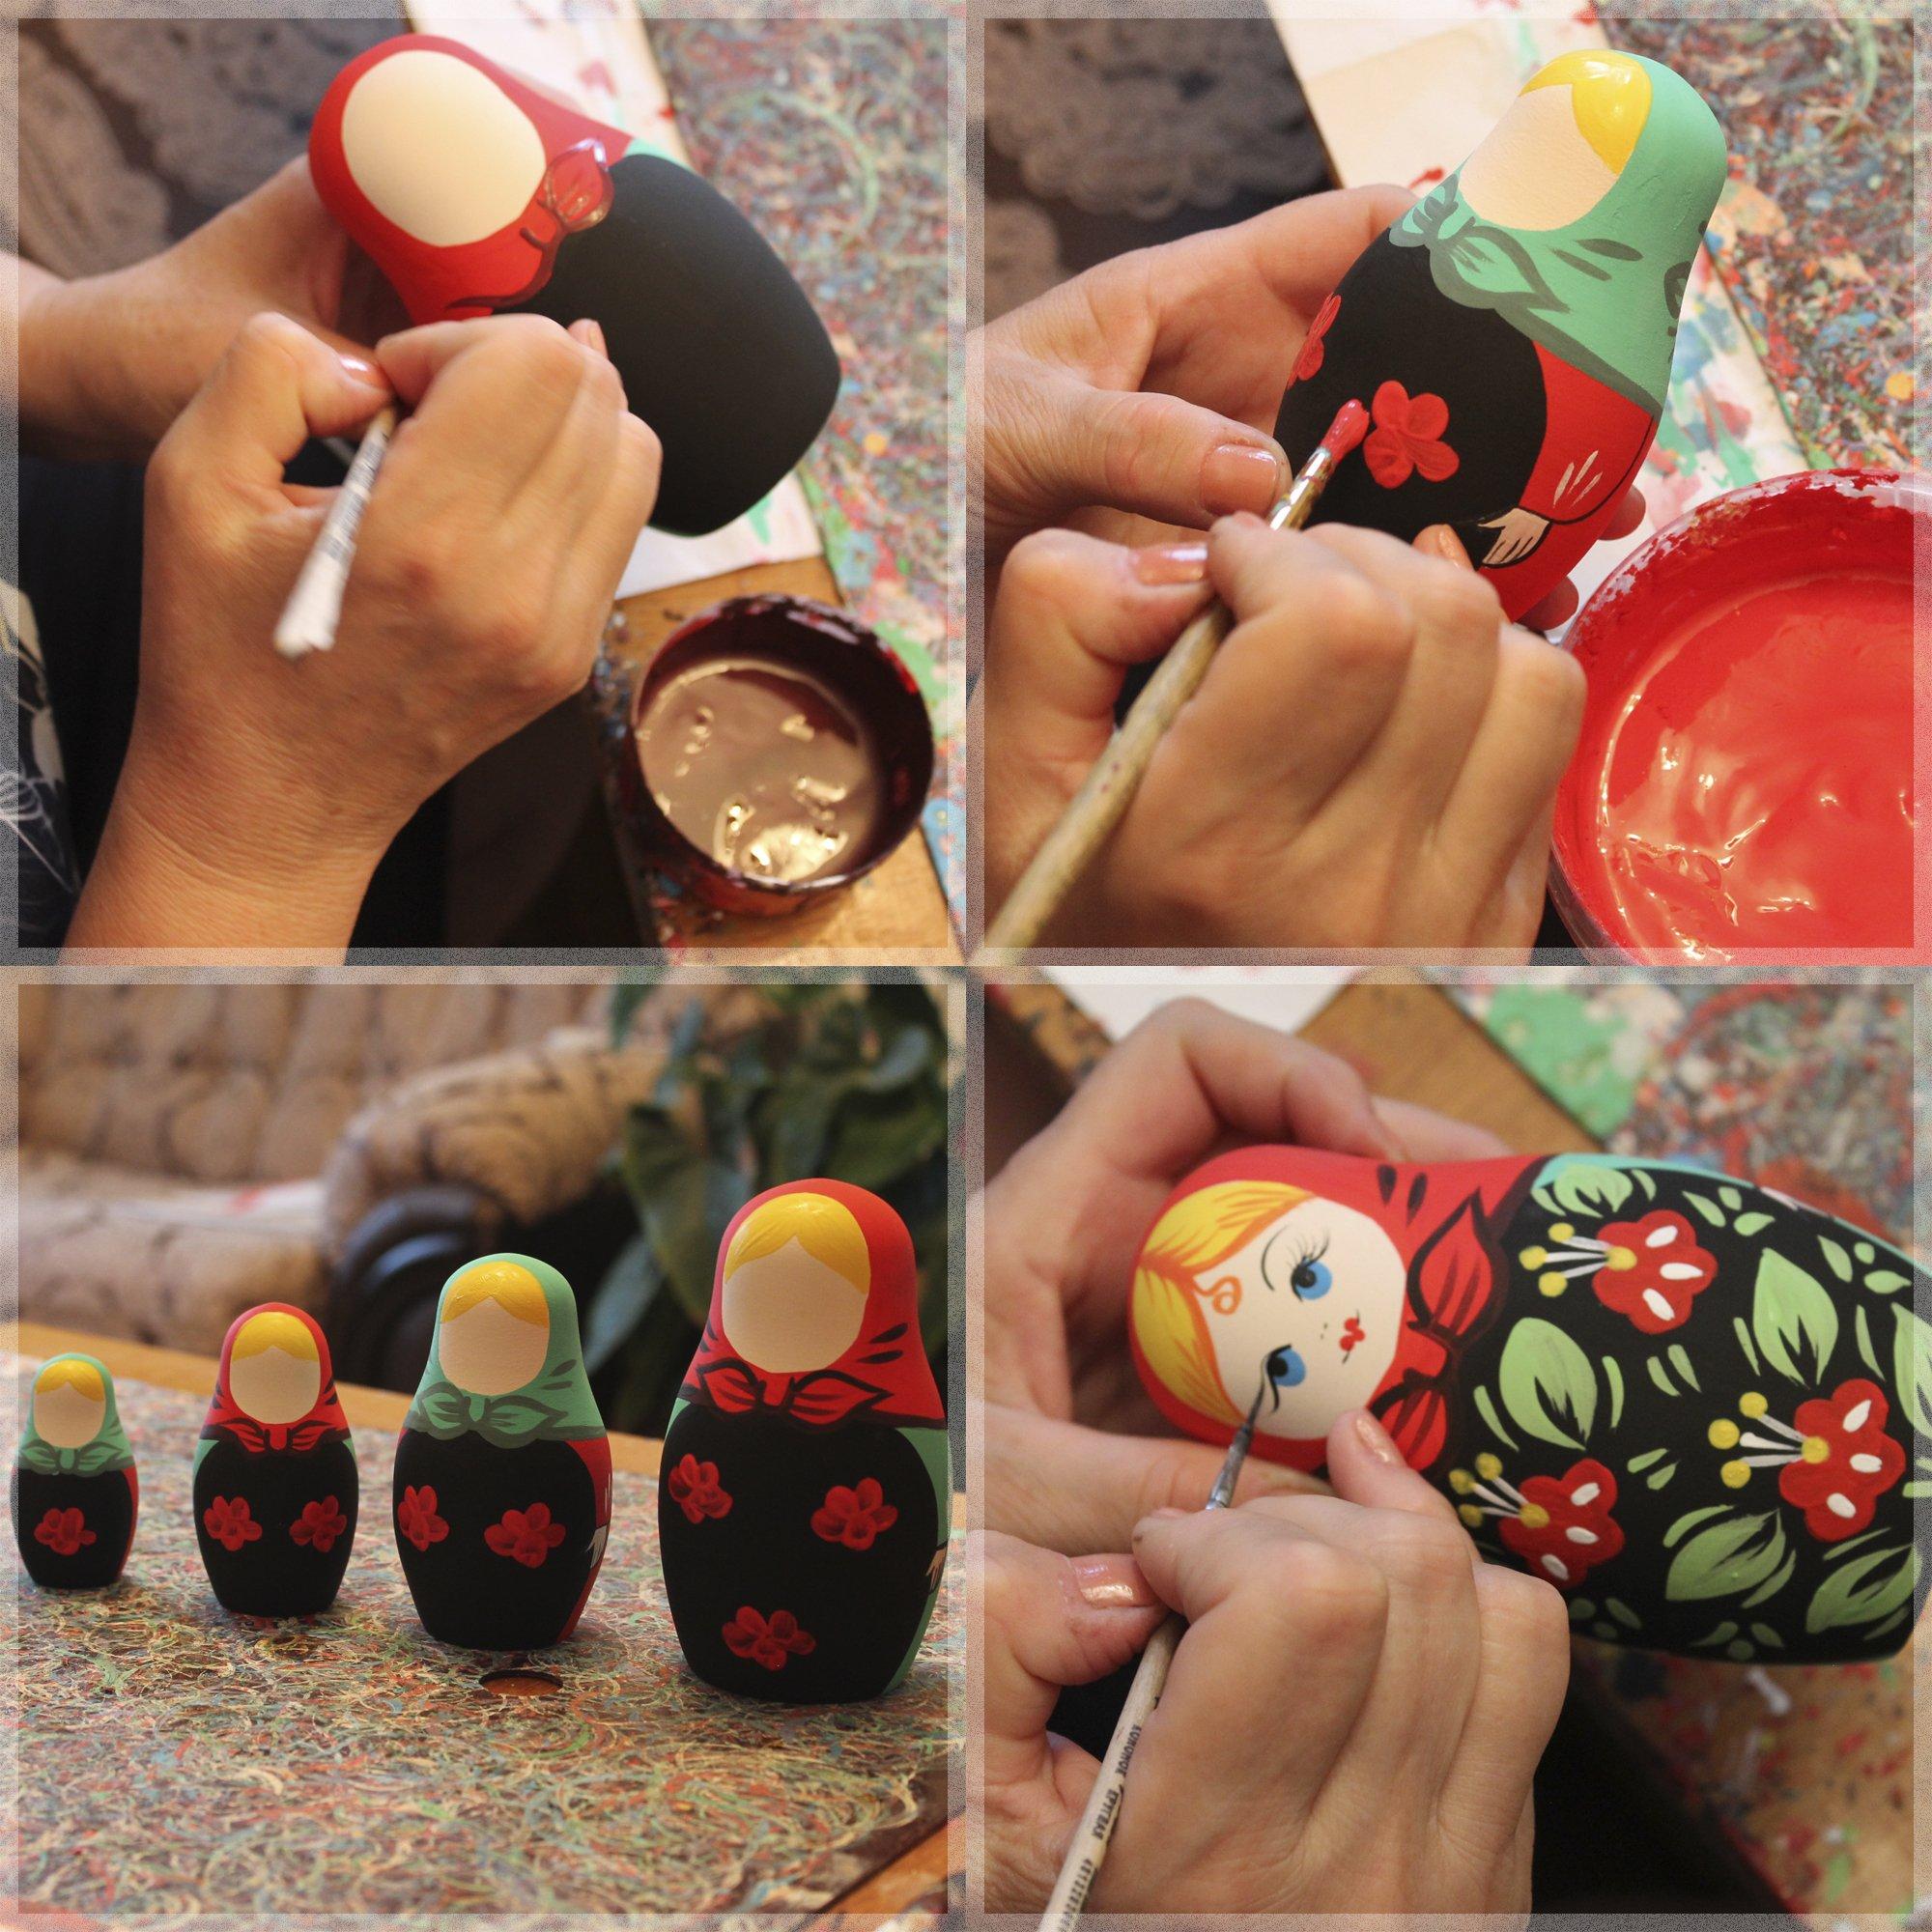 Lot 10 Unpainted Stacking Nesting Dolls Set 4 pcs - DIY Gifts by MATRYOSHKA&HANDICRAFT (Image #3)